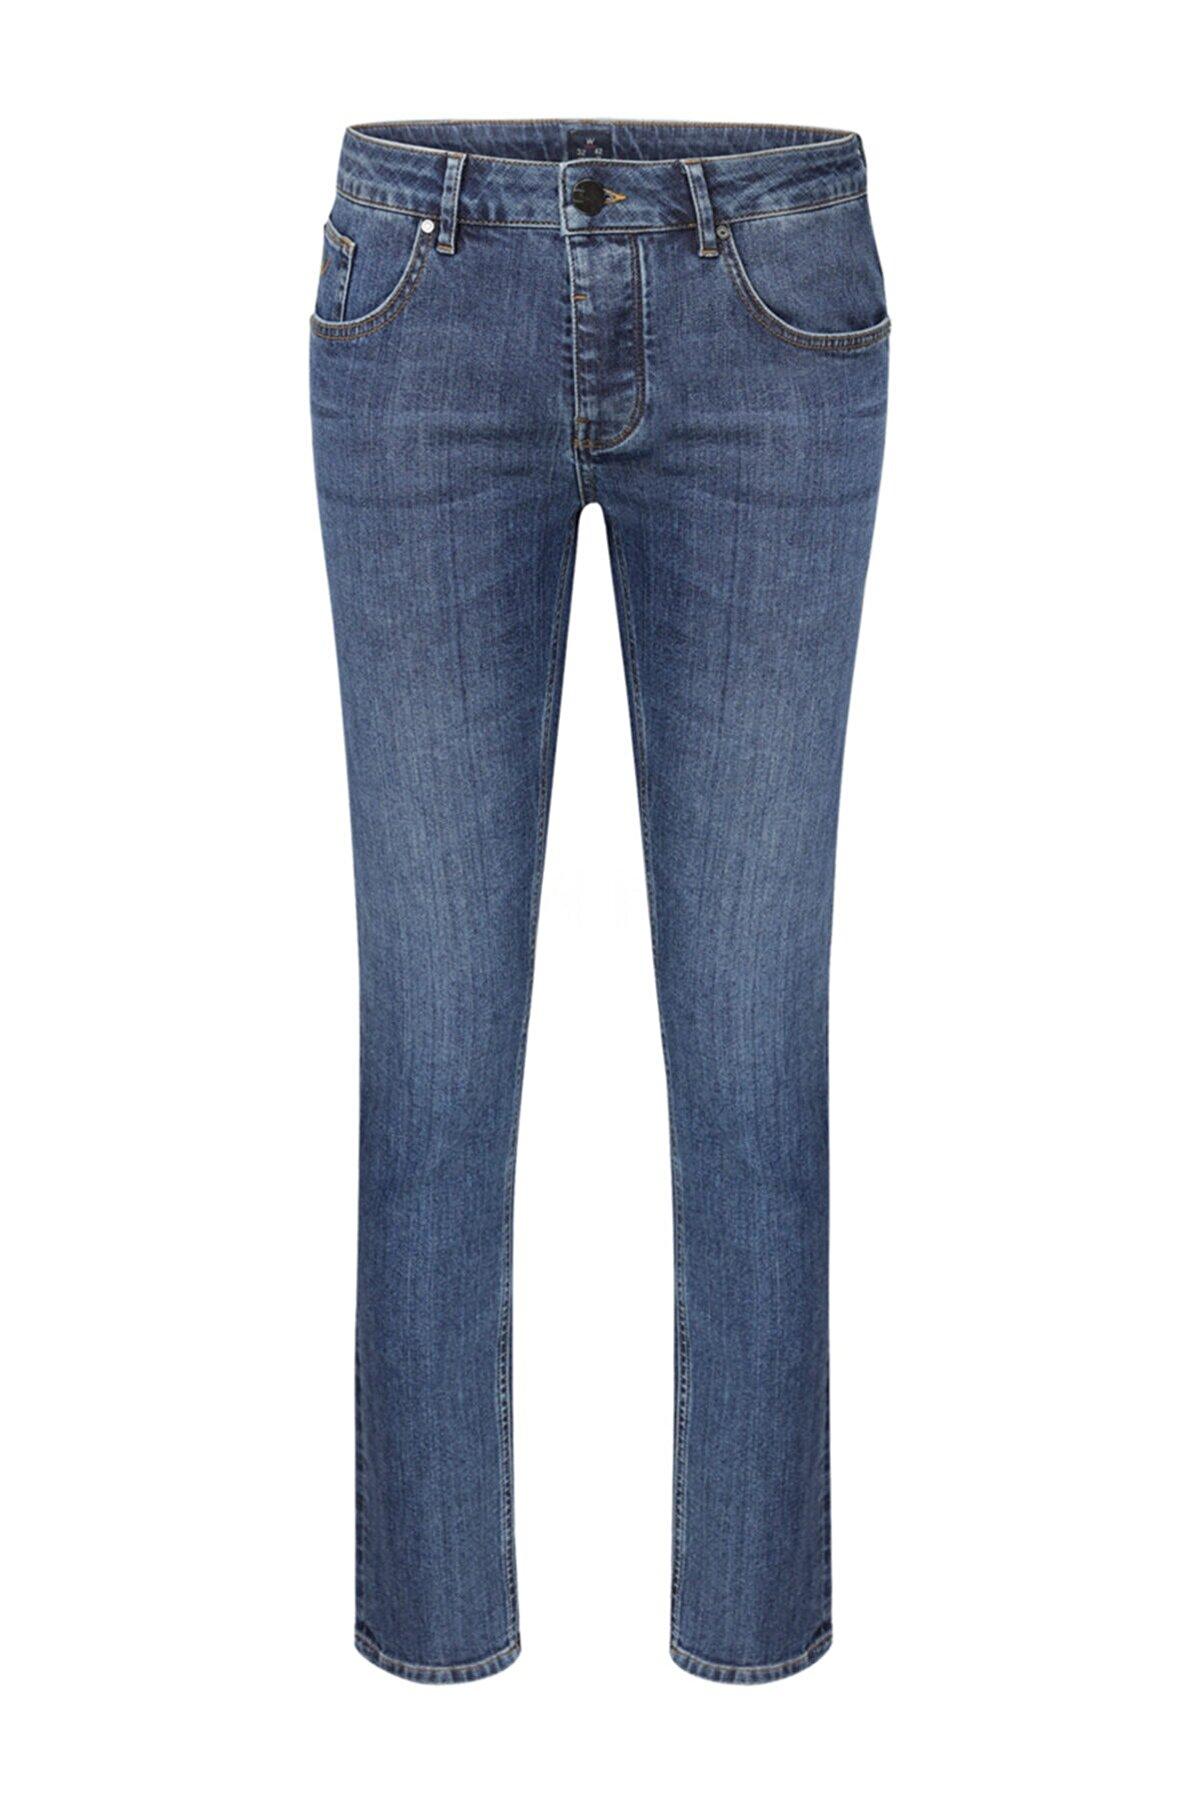 W Collection Indigo Denim Pantolon